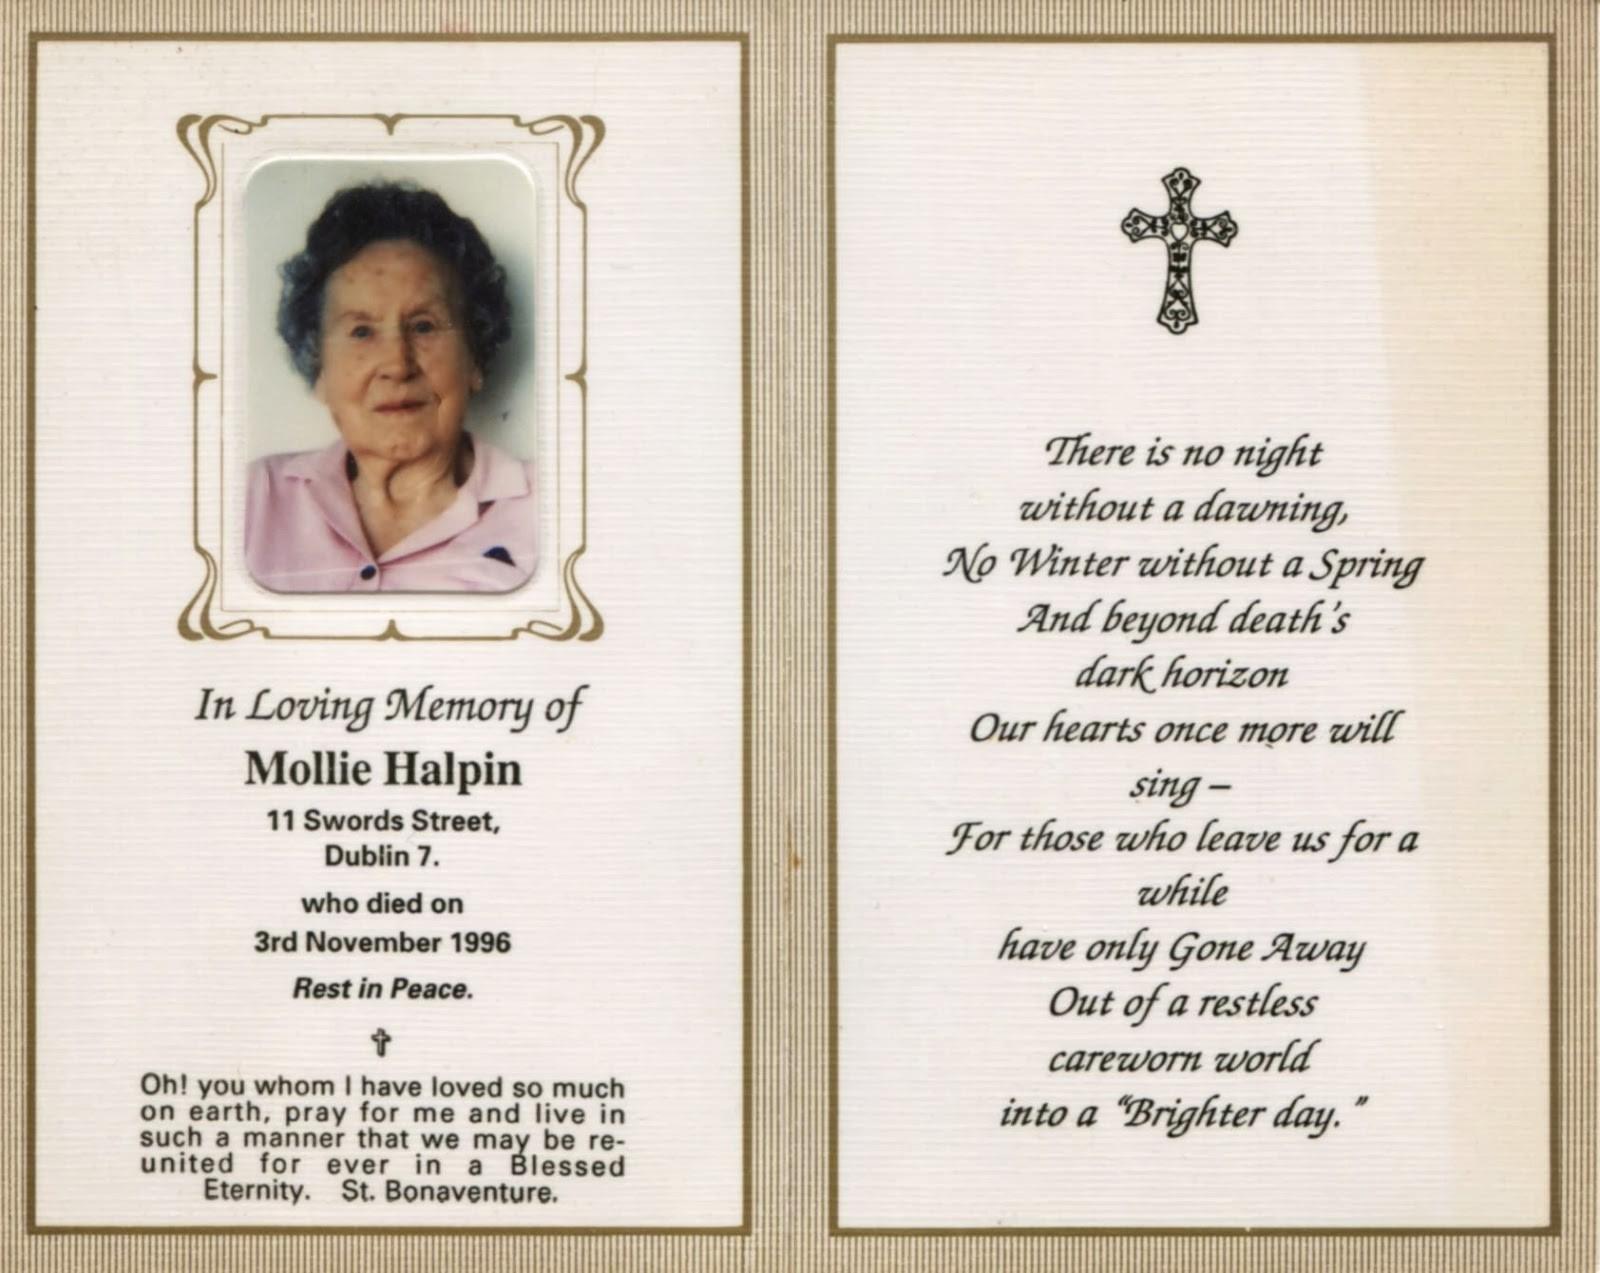 011 Free Printable Funeral Prayer Card Template Memorial Cards Of On - Free Printable Funeral Prayer Card Template